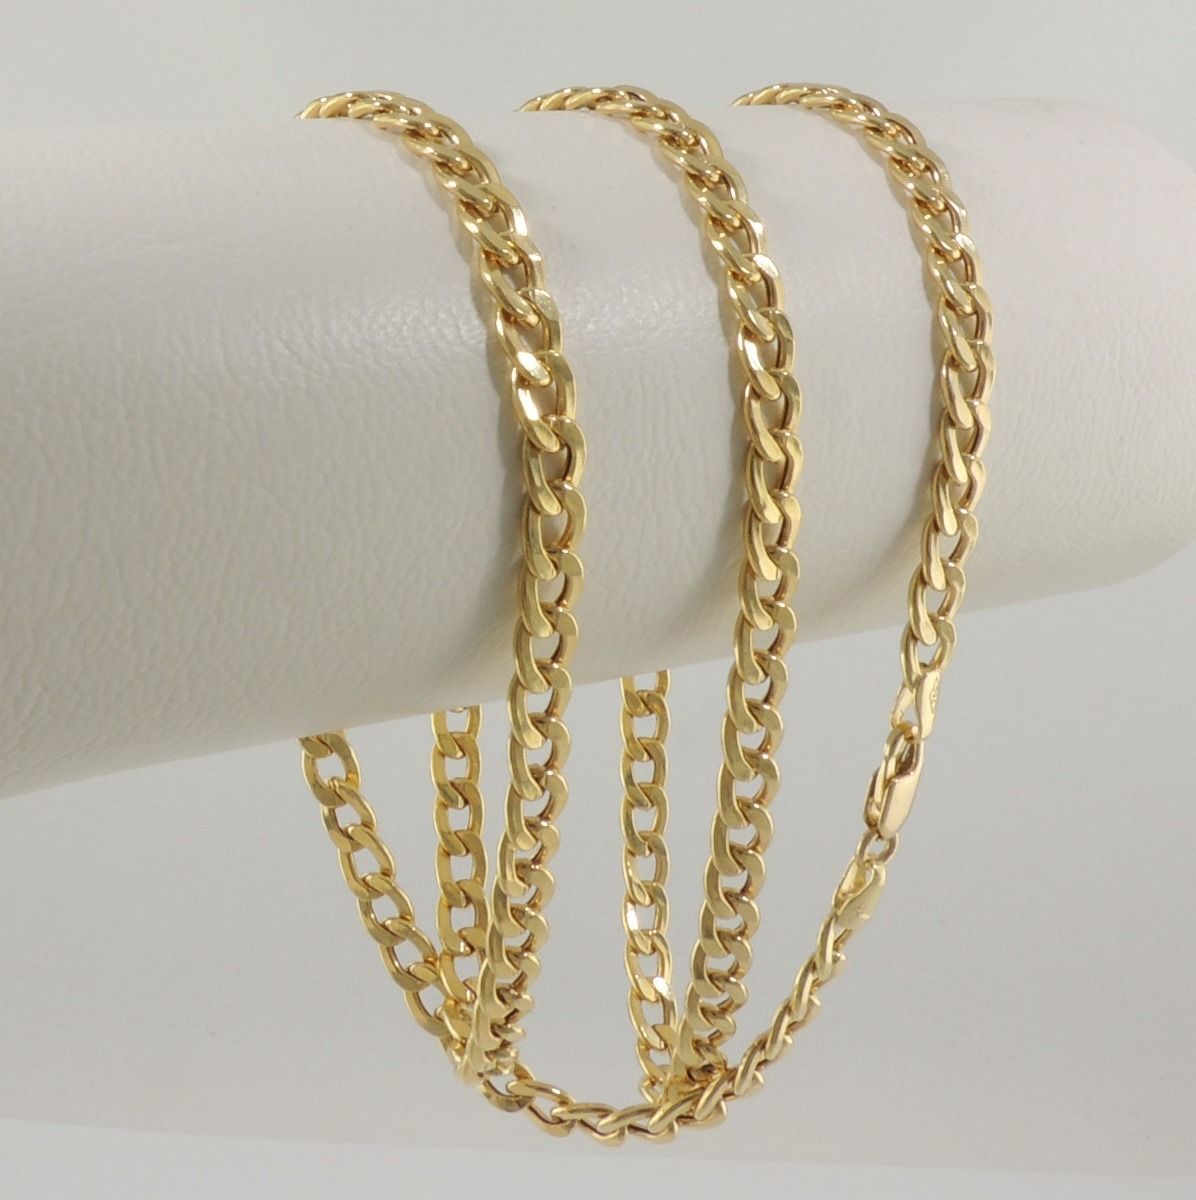 09ade02f88bf9 Carregando zoom... ouro colar corrente. Carregando zoom... corrente  masculina cordão grumet 4 60 cm ouro 18k 750 colar